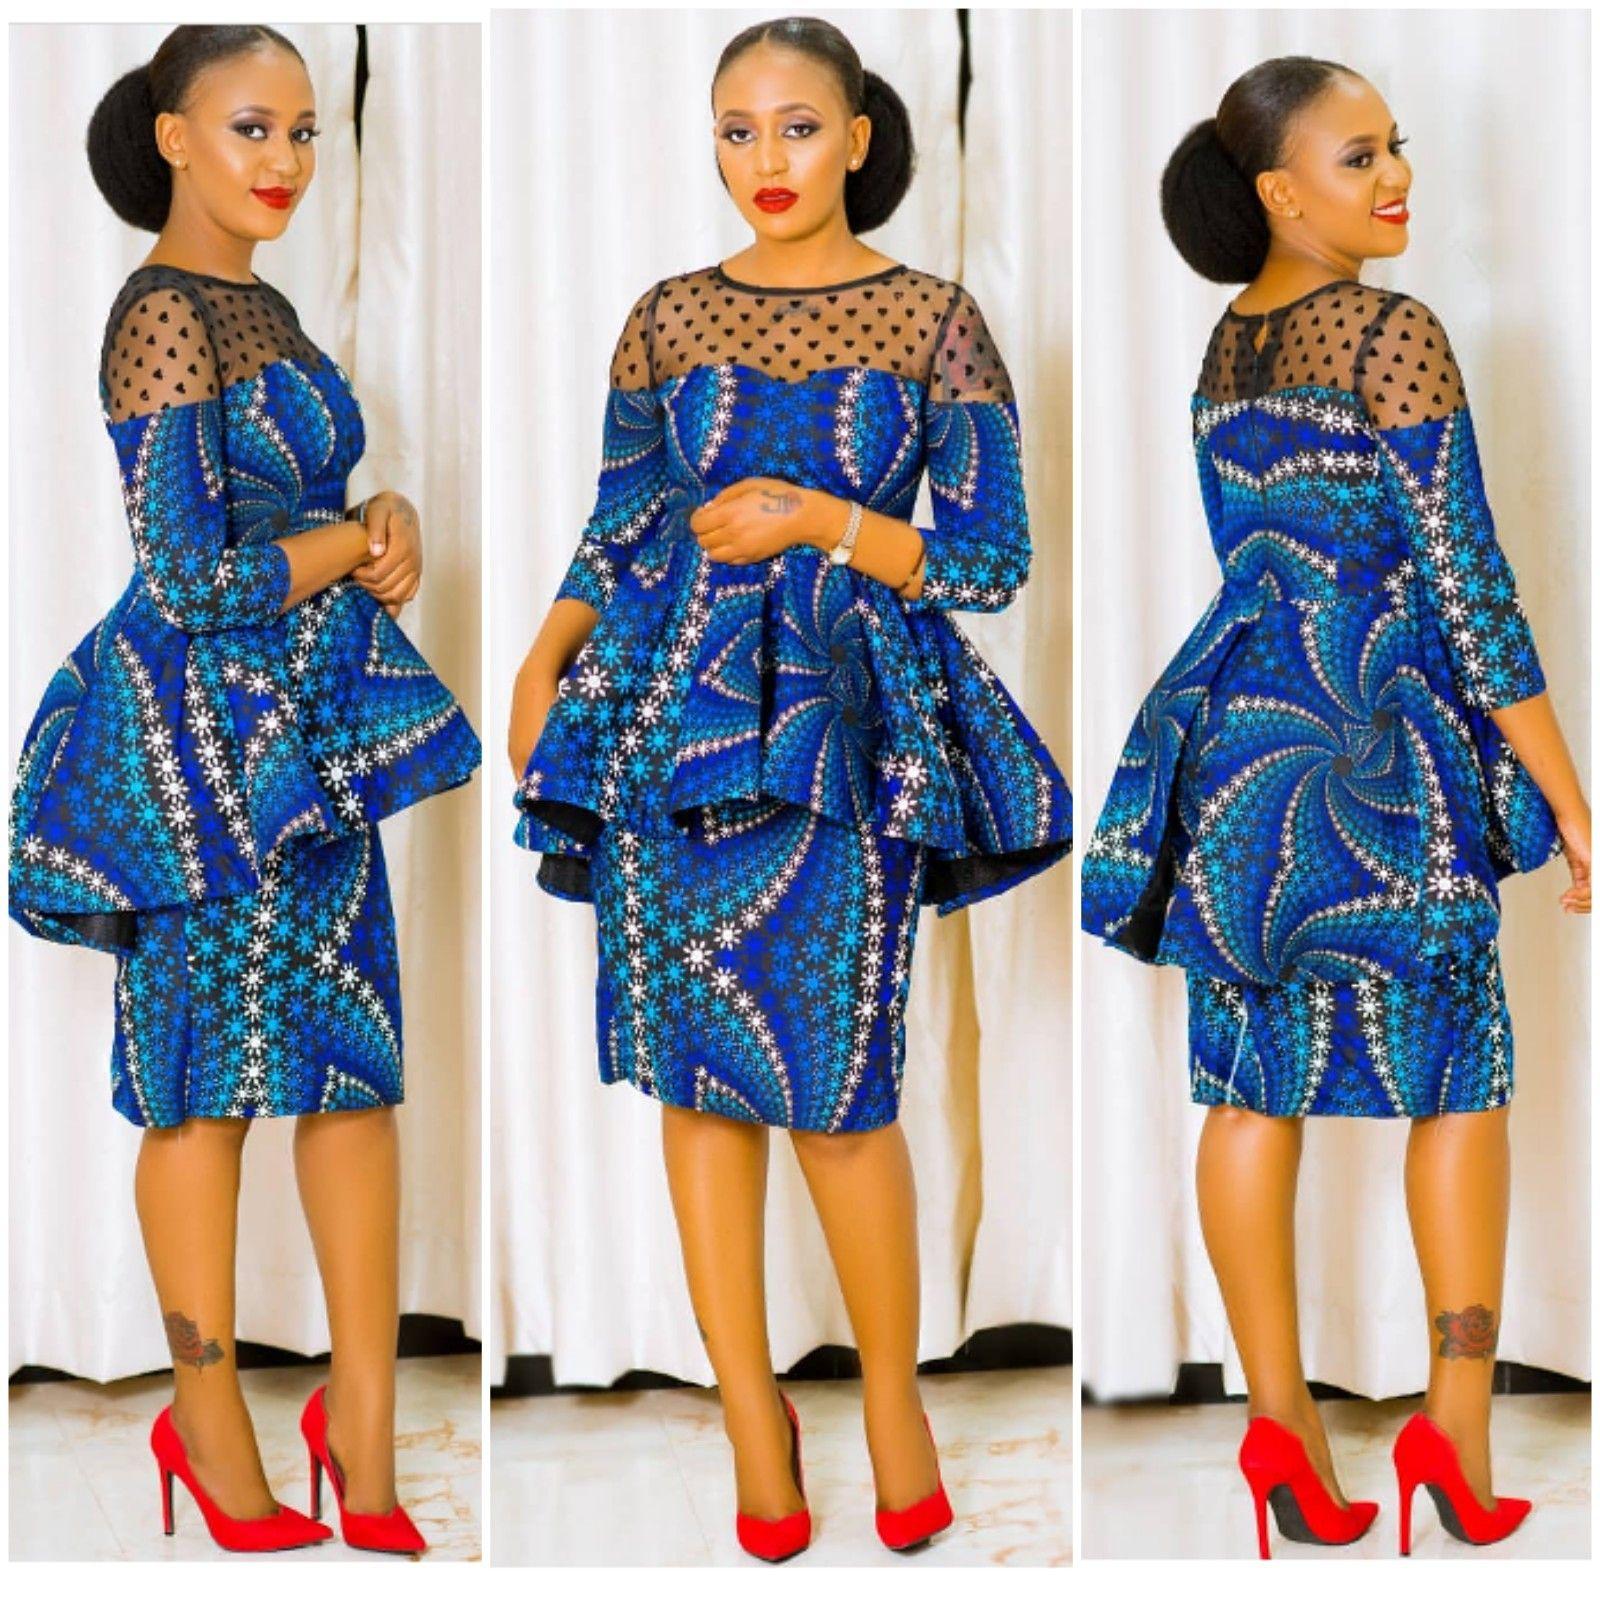 40 Best Of The Best Kitenge Short Dresses You Should Have In 2019 African Print Fashion Dresses Short Dress Styles Latest African Fashion Dresses